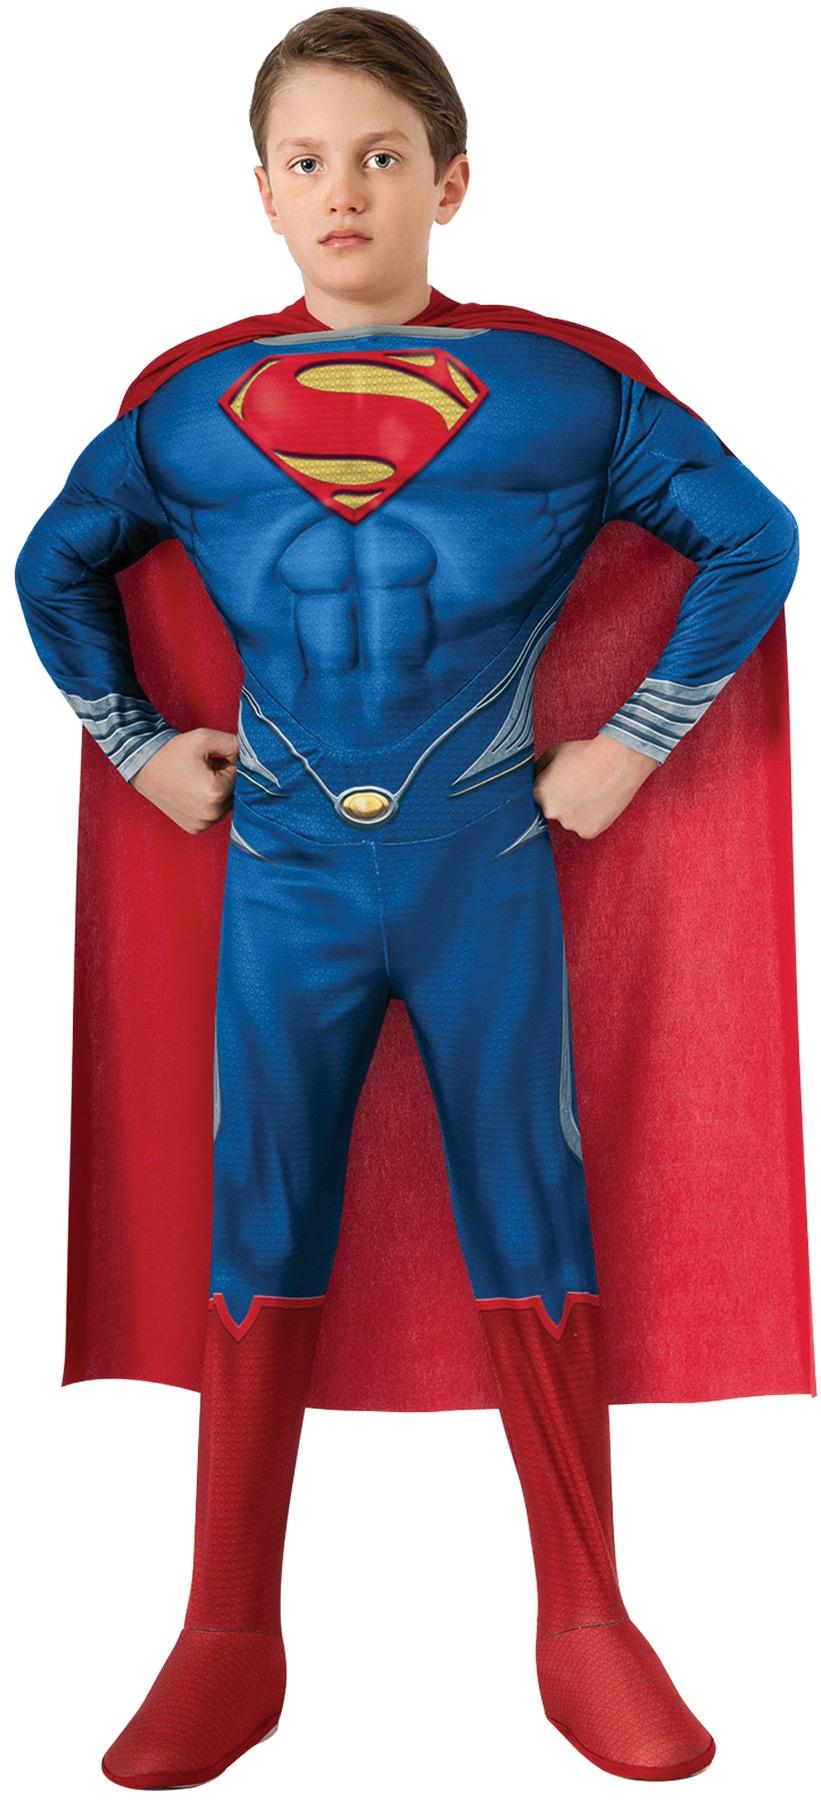 Детский костюм Эффектного Супермена (32) детский костюм озорного клоуна 34